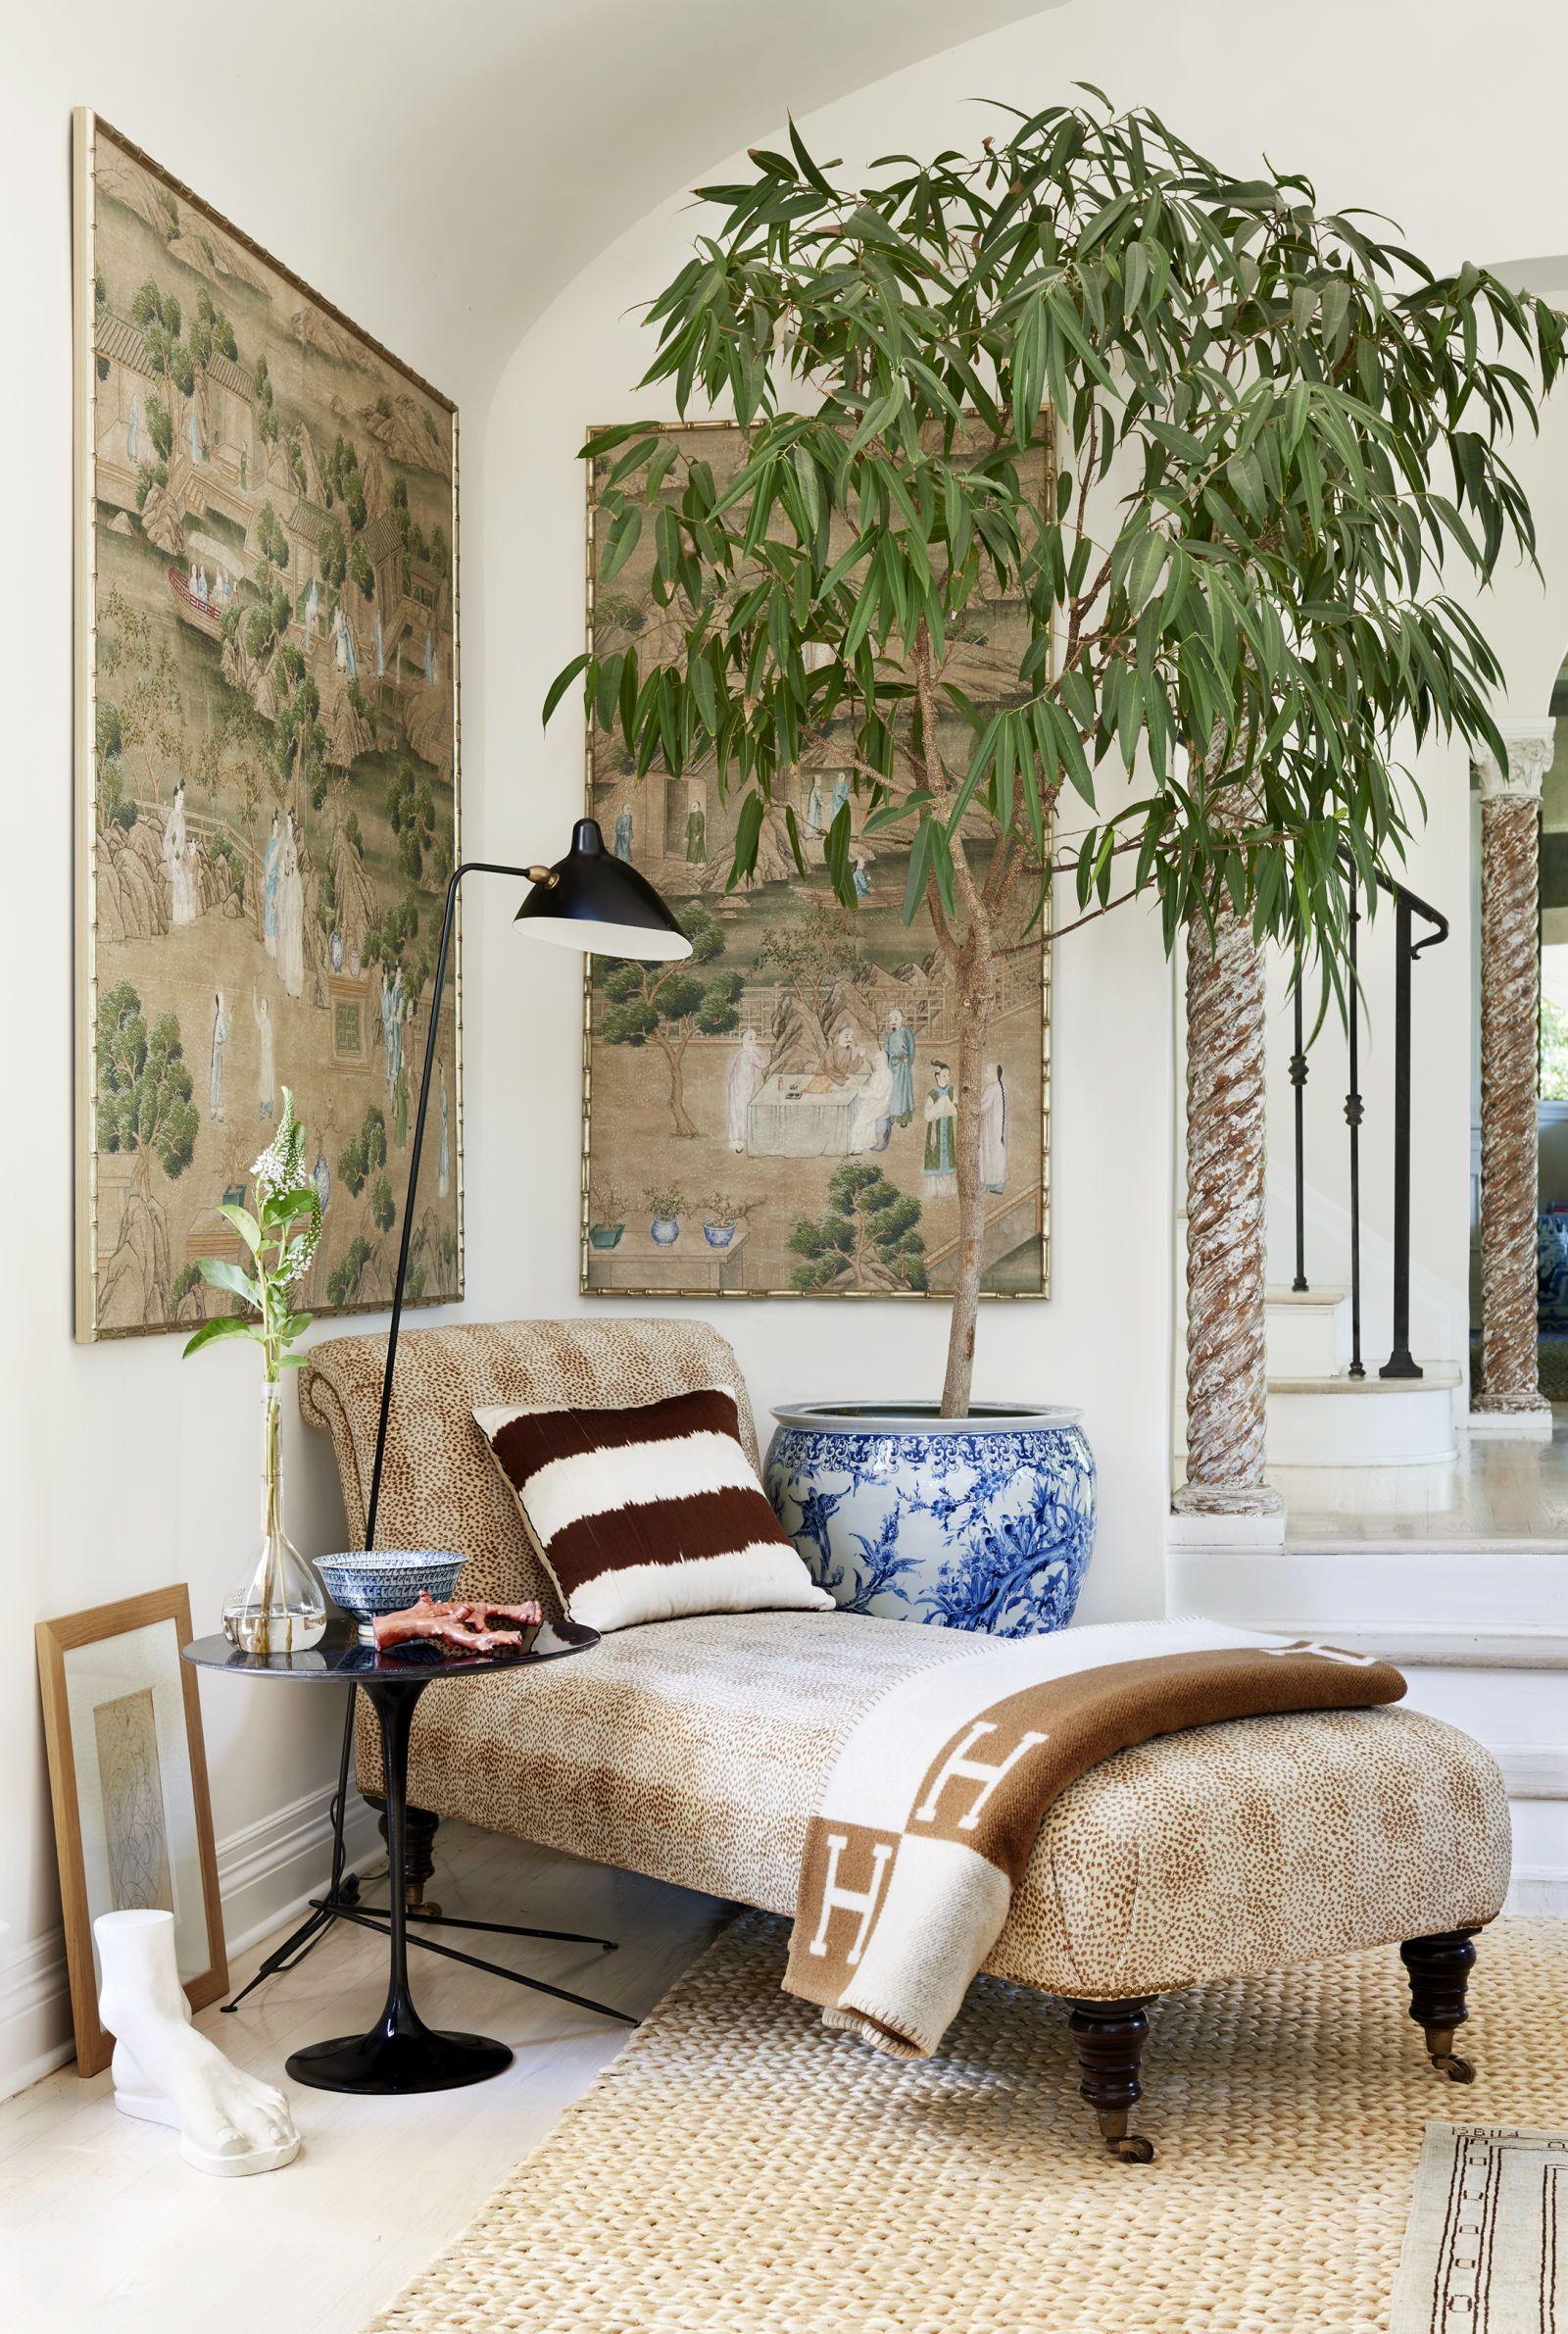 Harpersbazaarcom Chinese Plantshouse Interior Designinterior